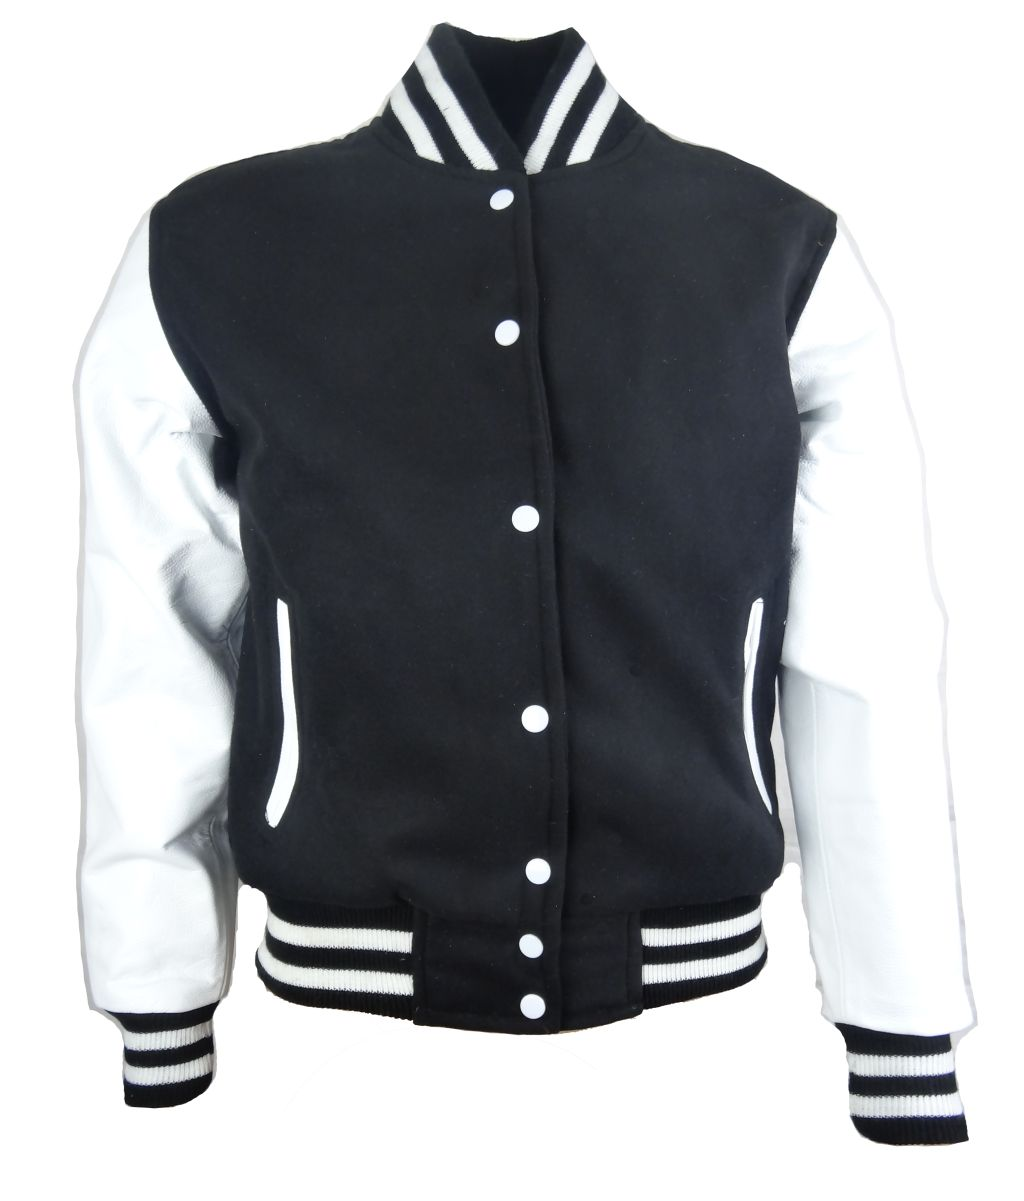 Herren College Jacke Sweat Jacke Lederarme Schwarz-Weiß S - 5 XL